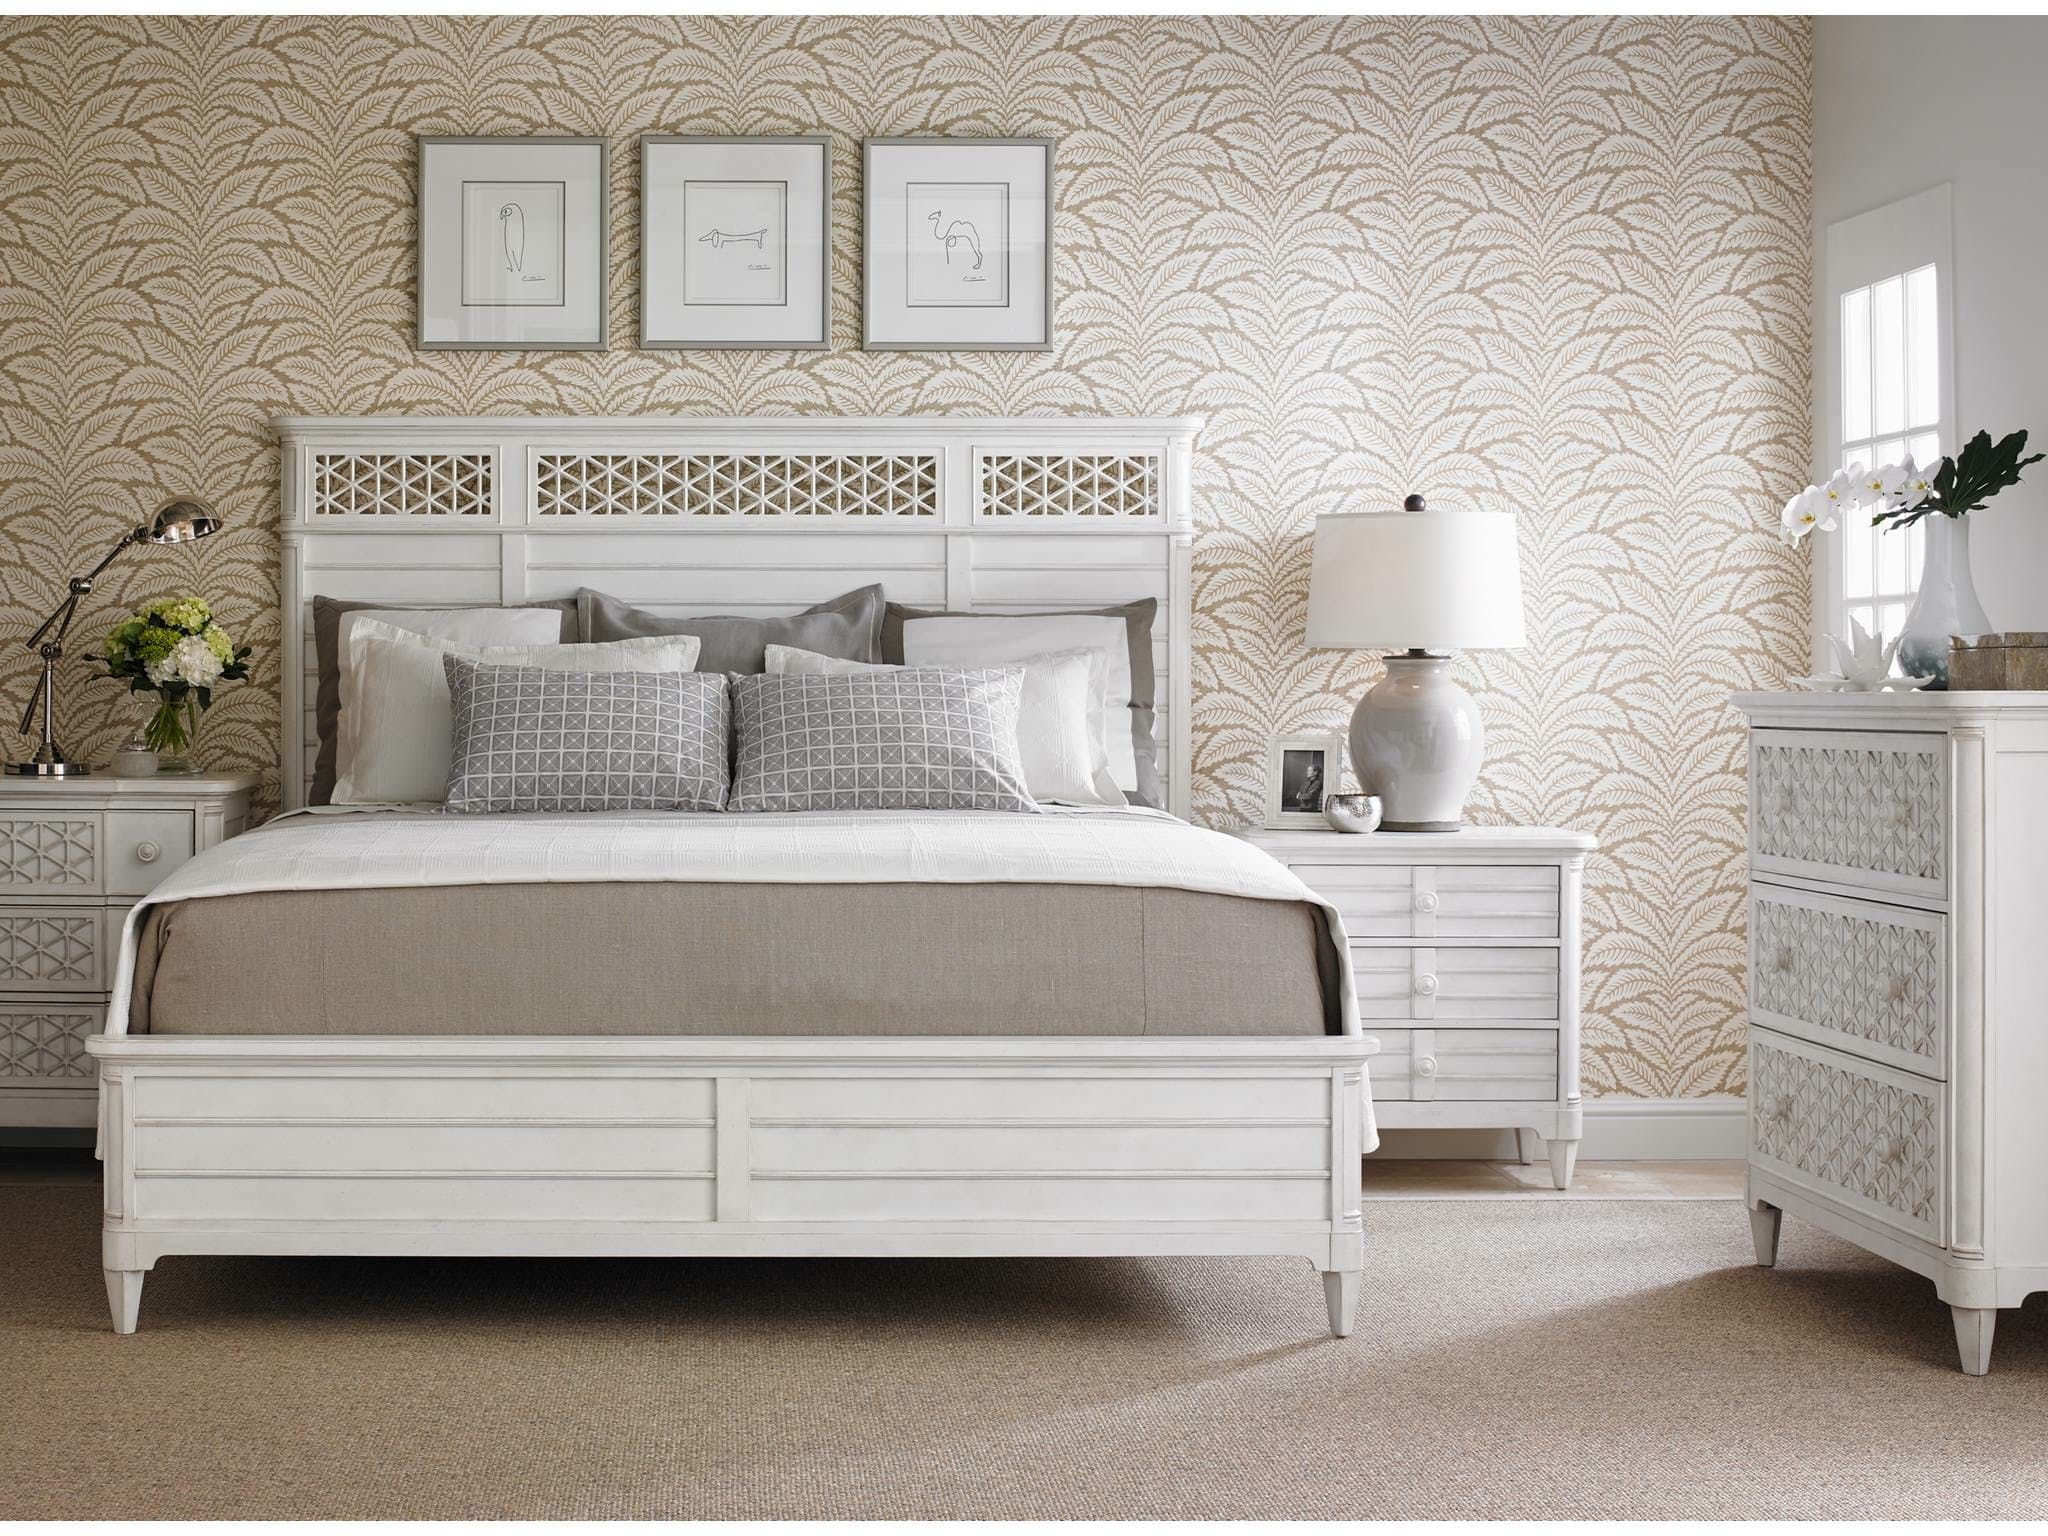 Stanley Furniture Bedroom Media Chest 451-23-04 - Louis ...